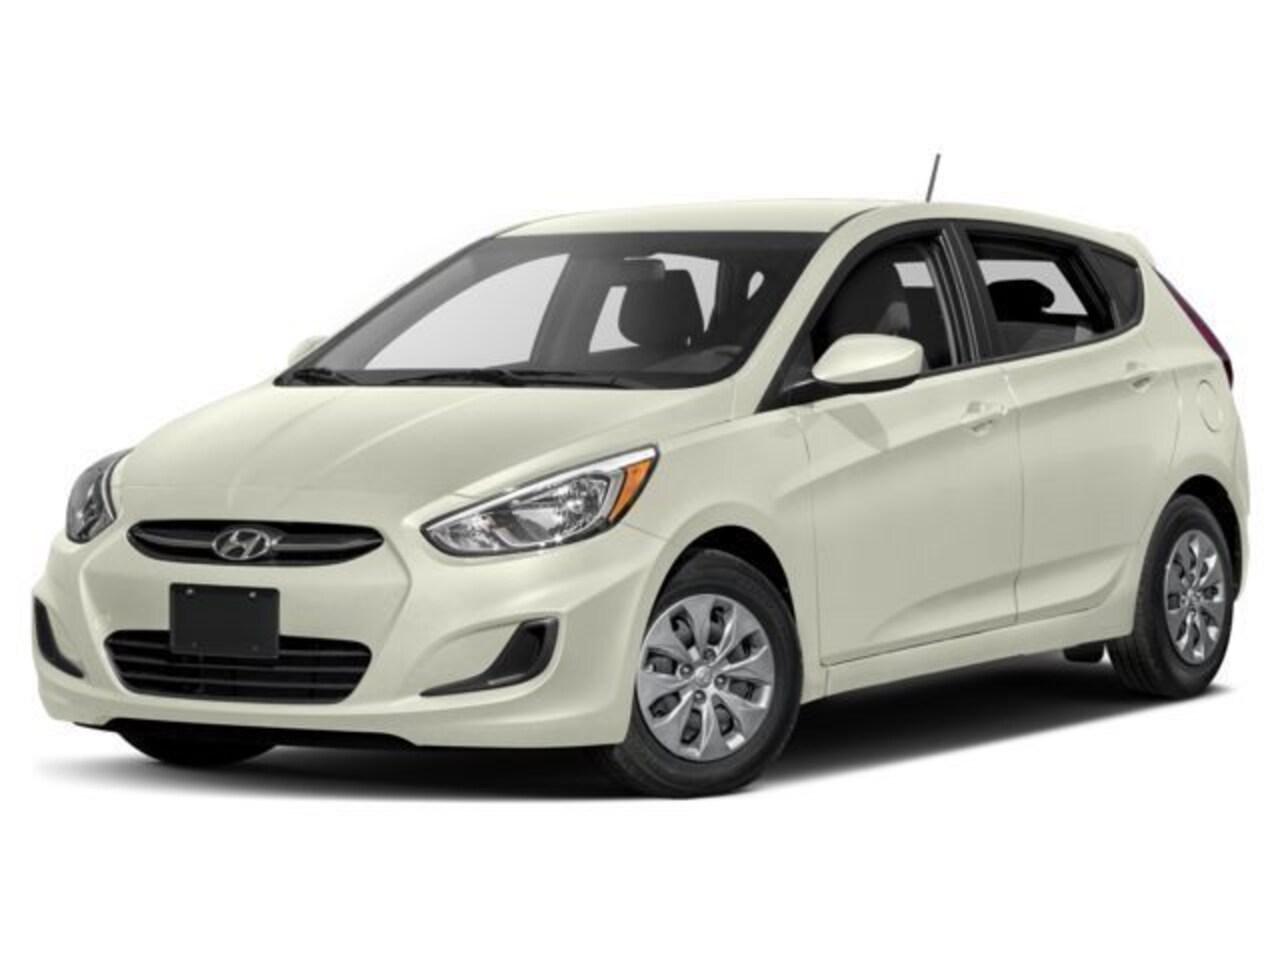 2017 Hyundai Accent (5) GL - MT Hatchback